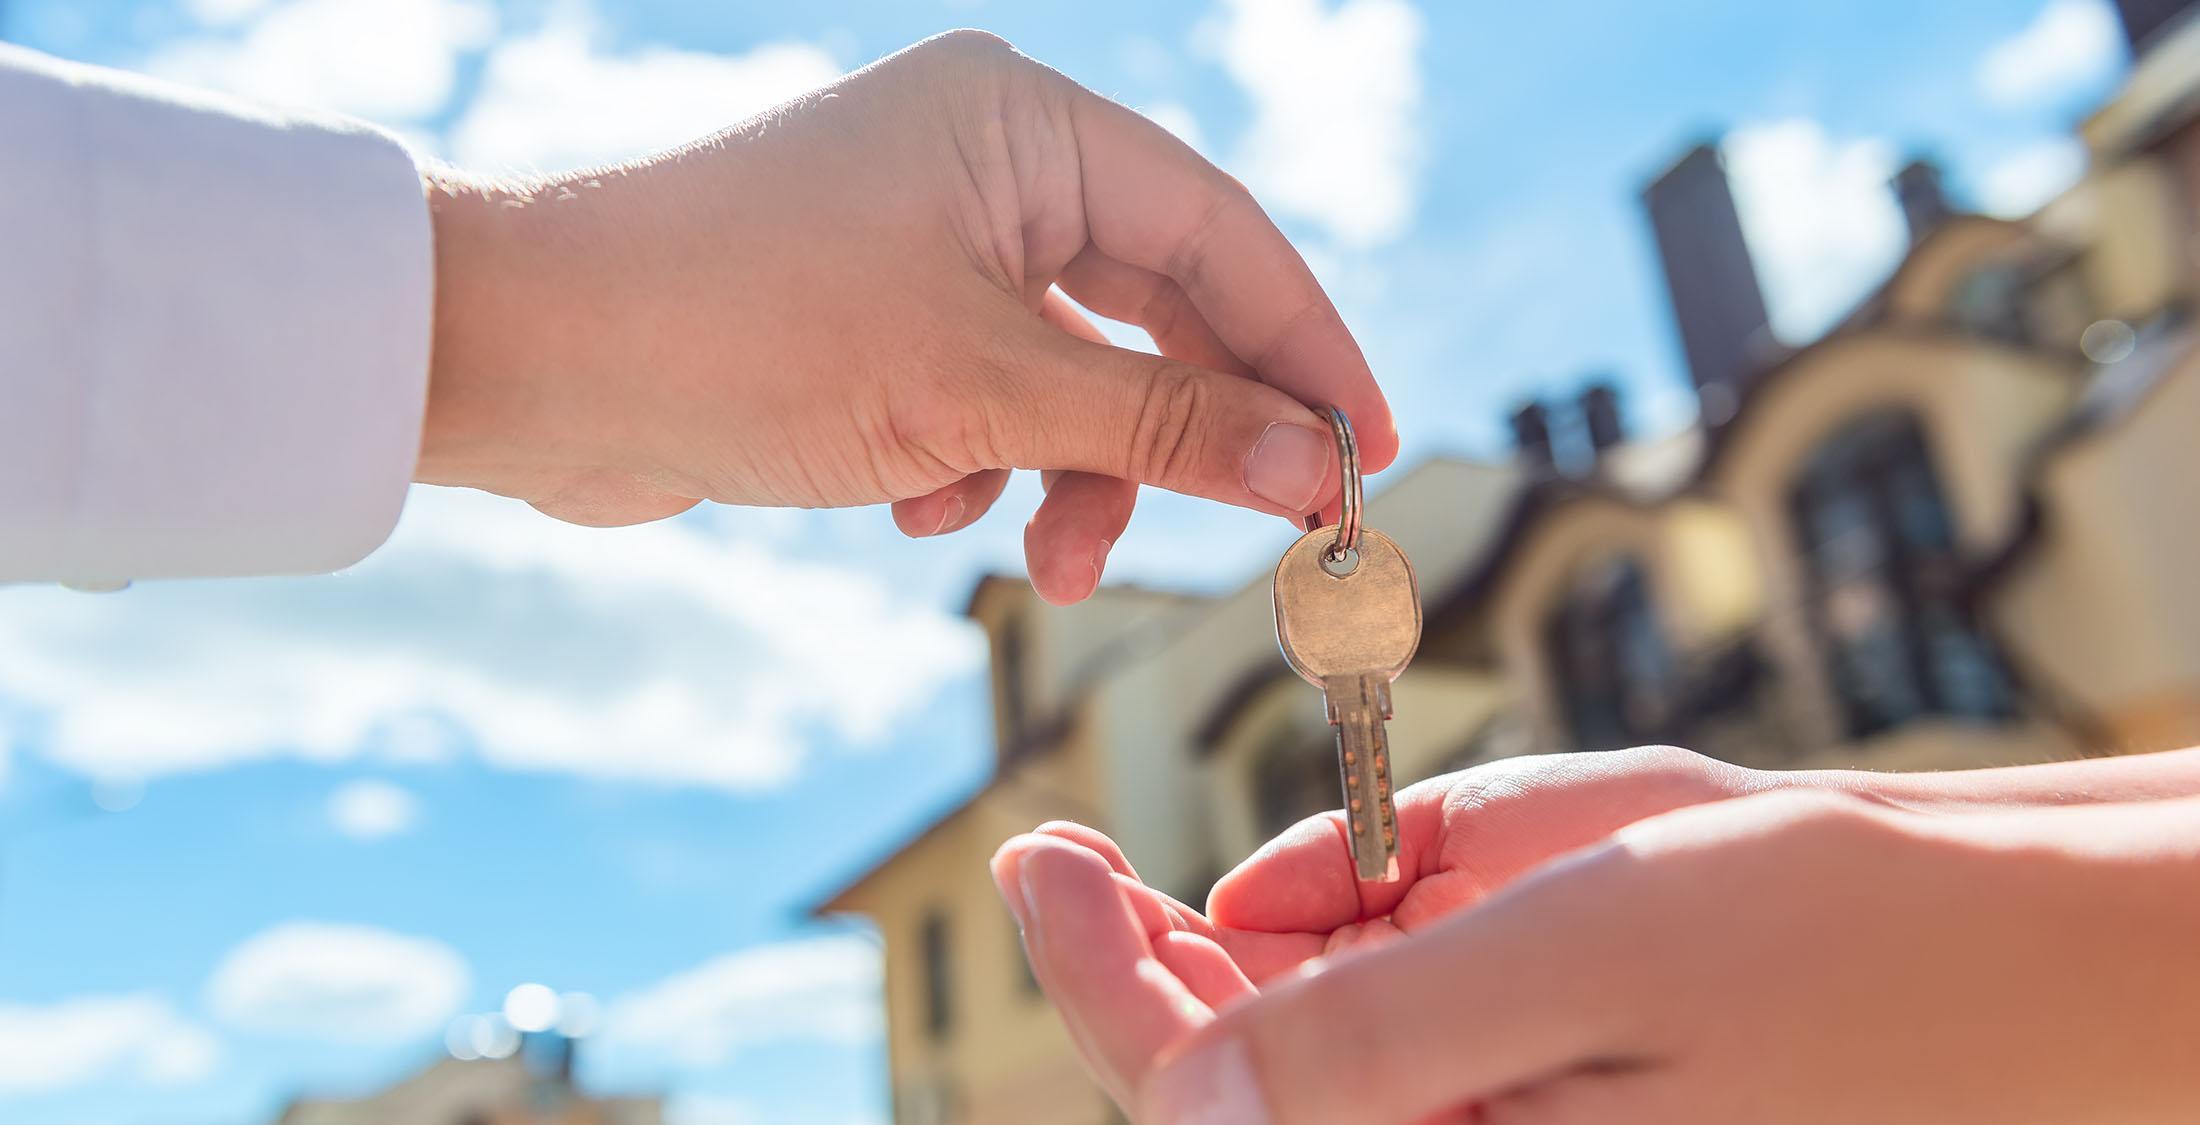 handing off keys in front of house